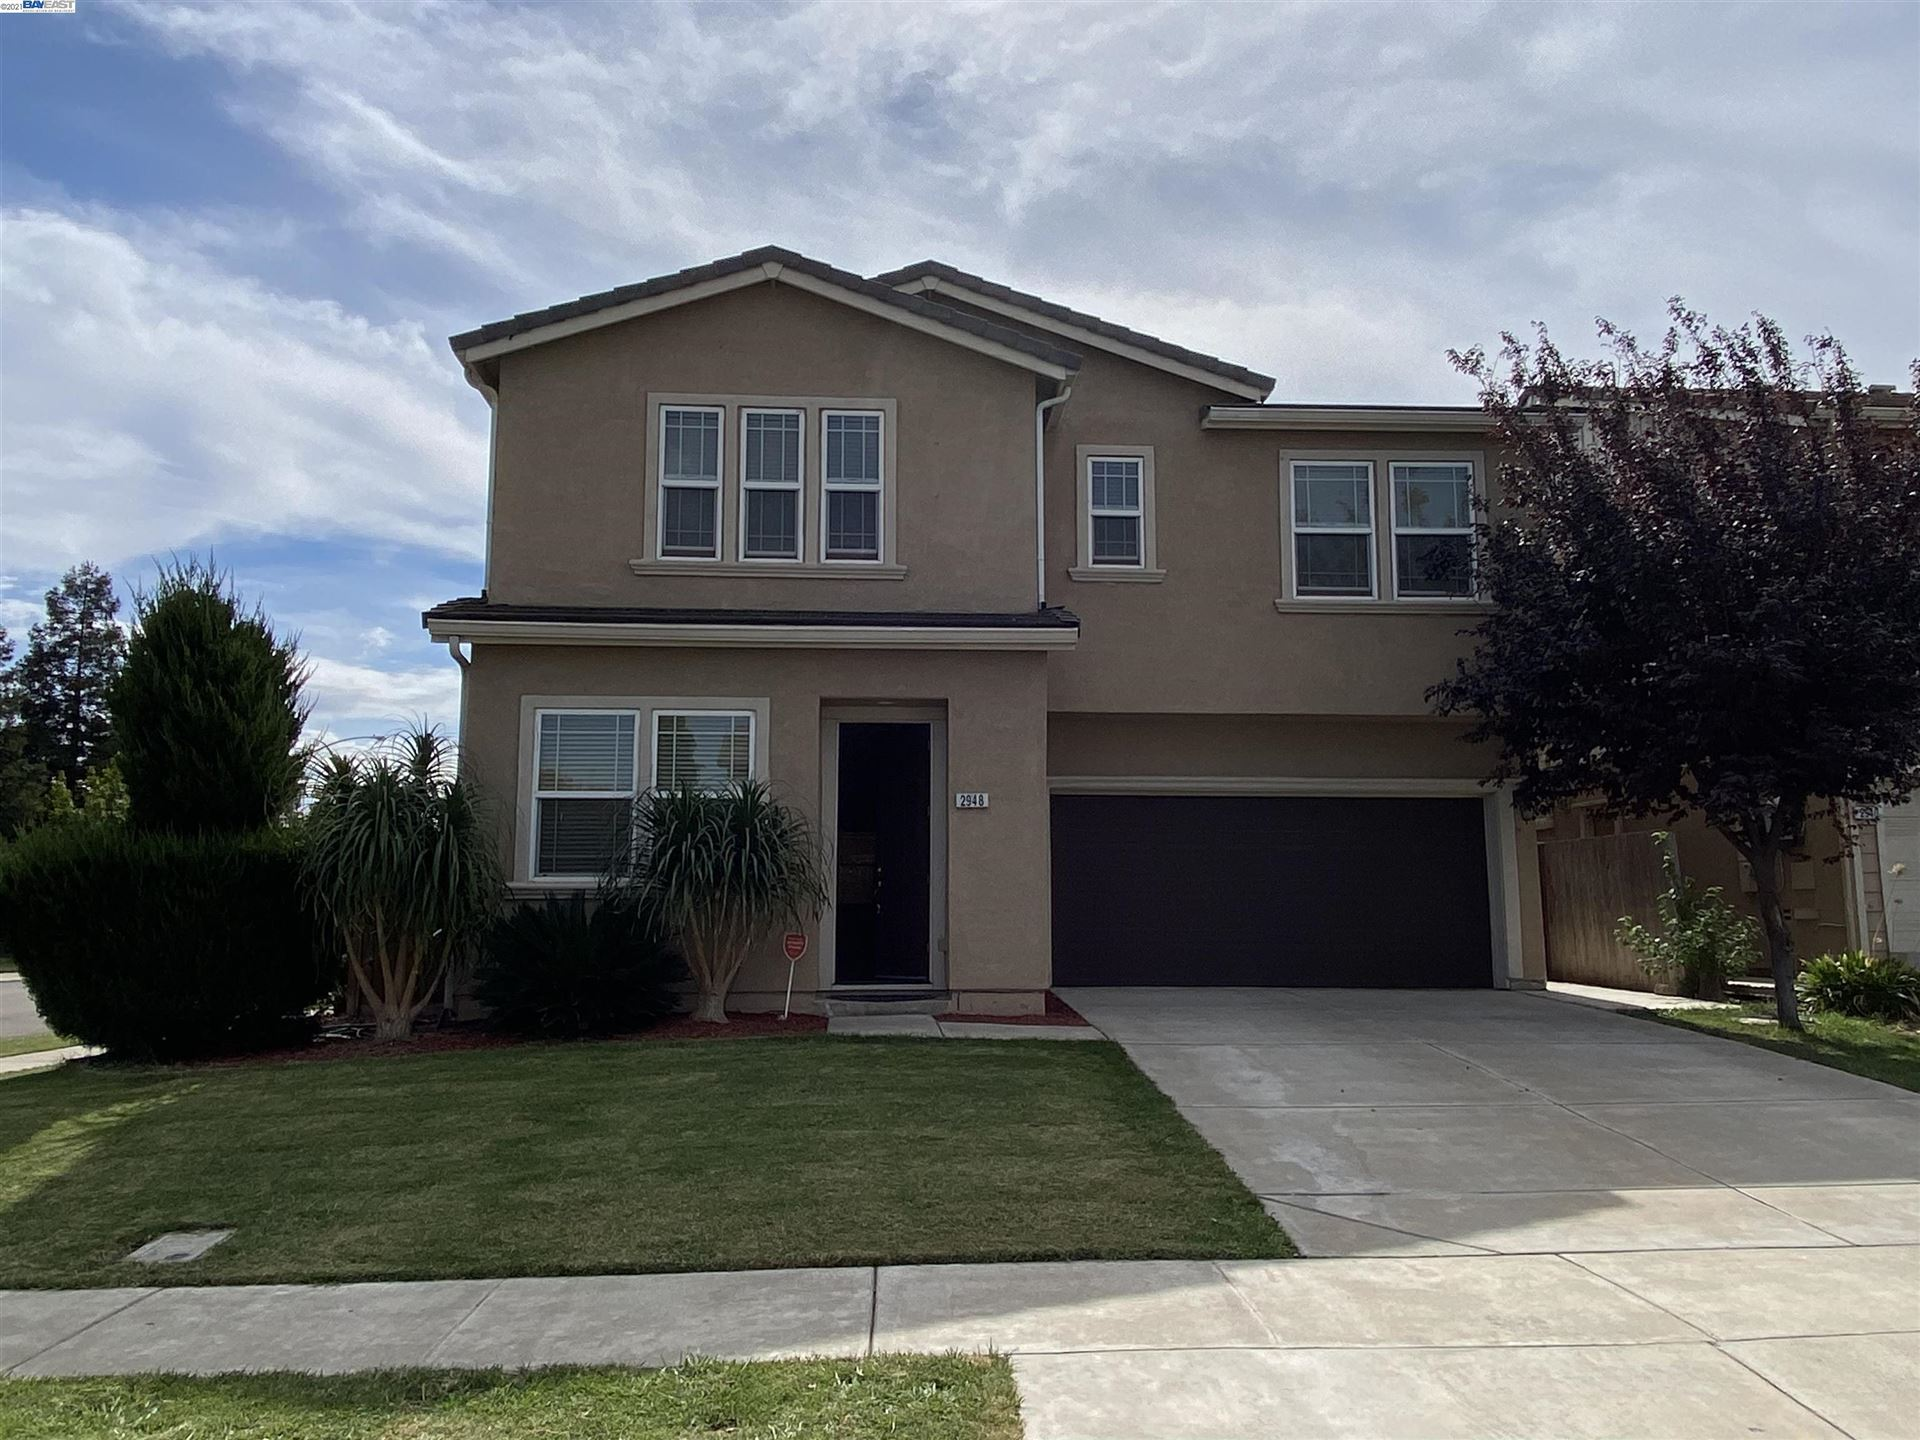 2948 Rapid Brook Ct, Stockton, CA 95212 - MLS#: 40970735